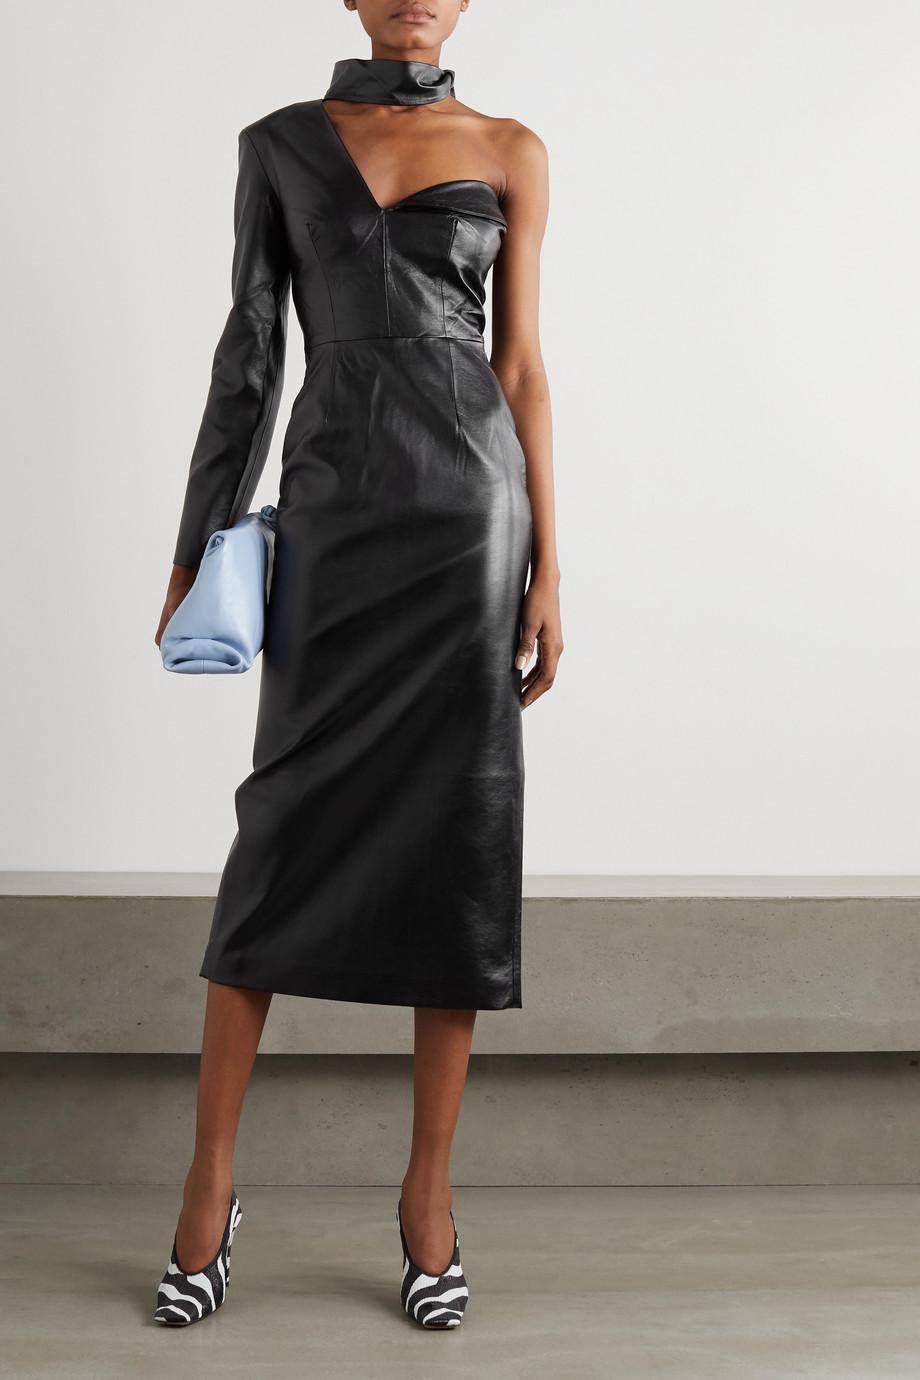 MATERIEL One-shoulder scarf-detail faux leather midi dress